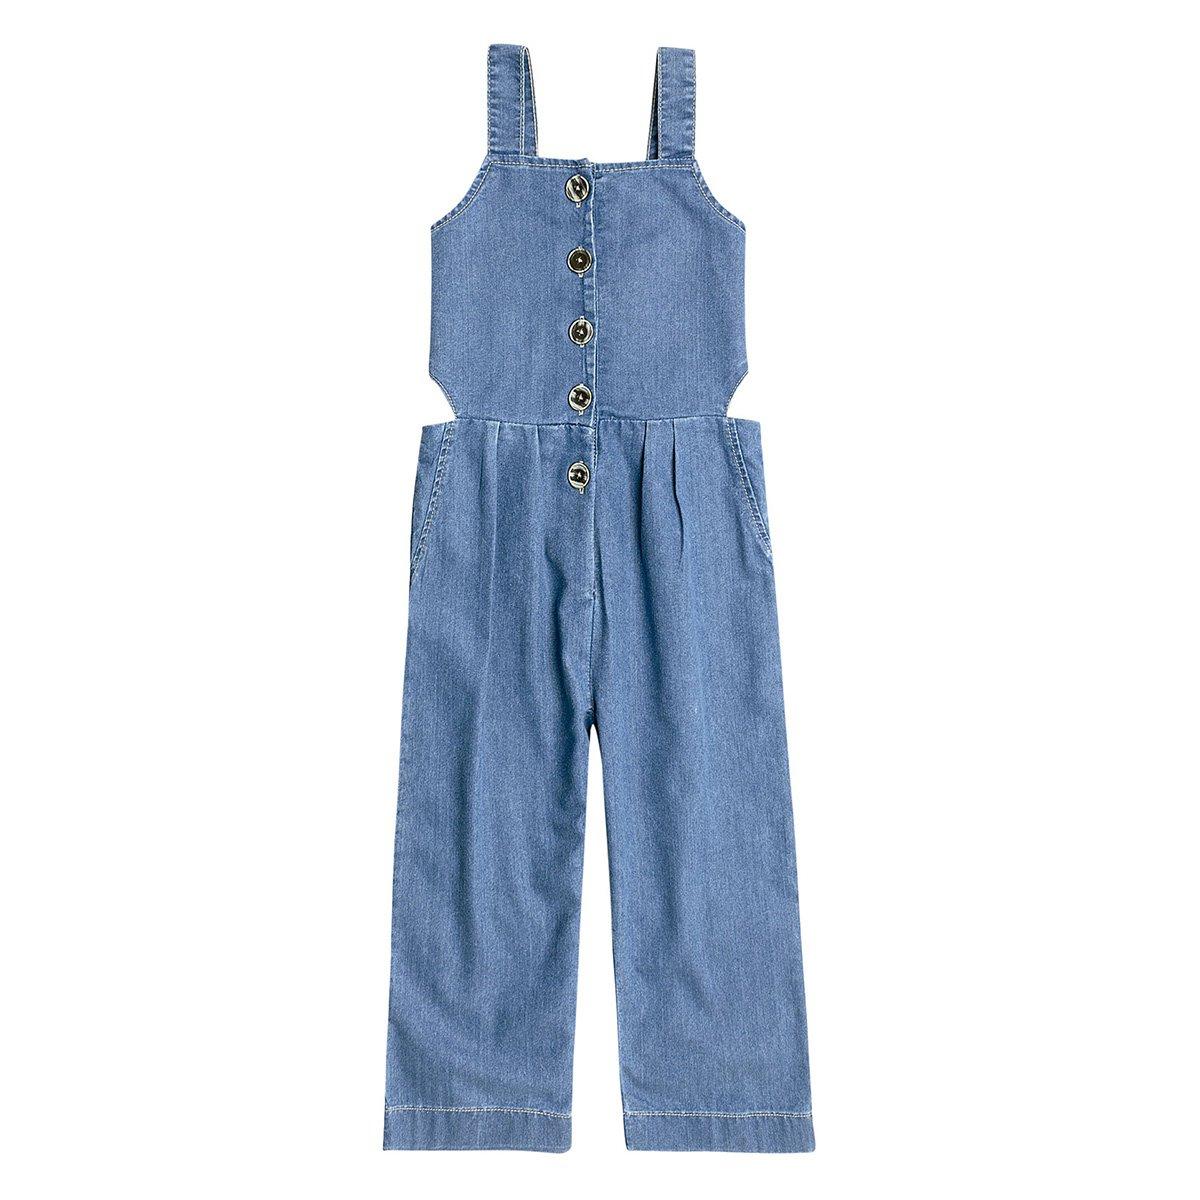 Macacão Juvenil Hering Jeans Feminino